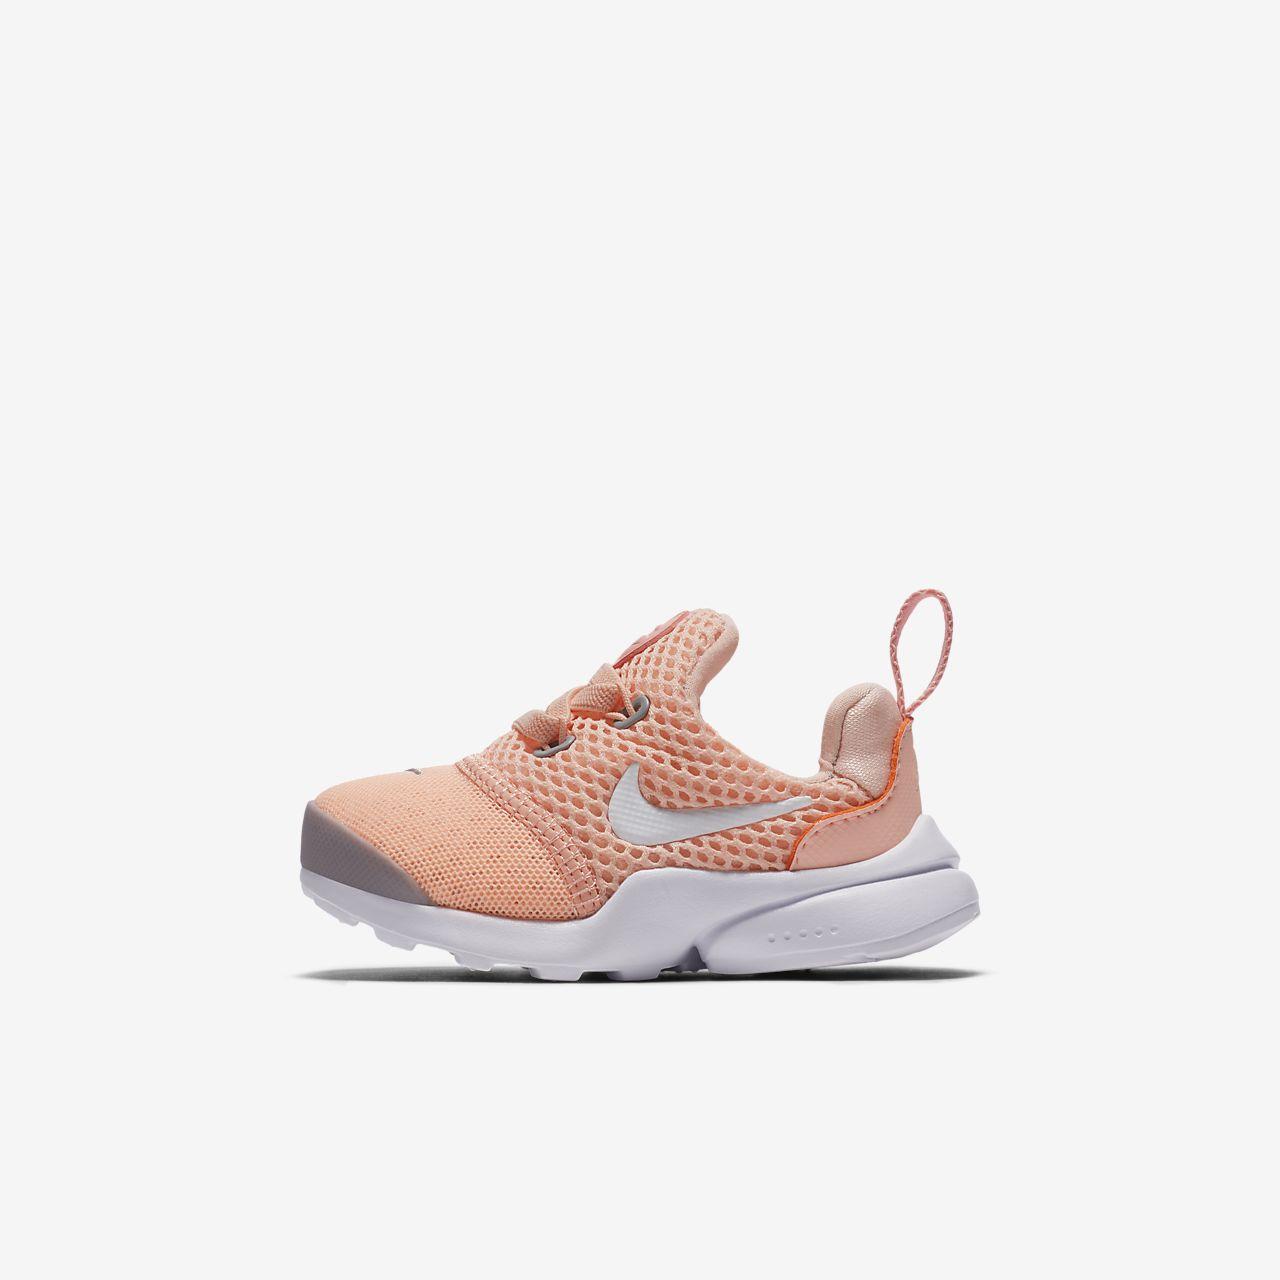 ... Nike Presto Fly Baby & Toddler Shoe